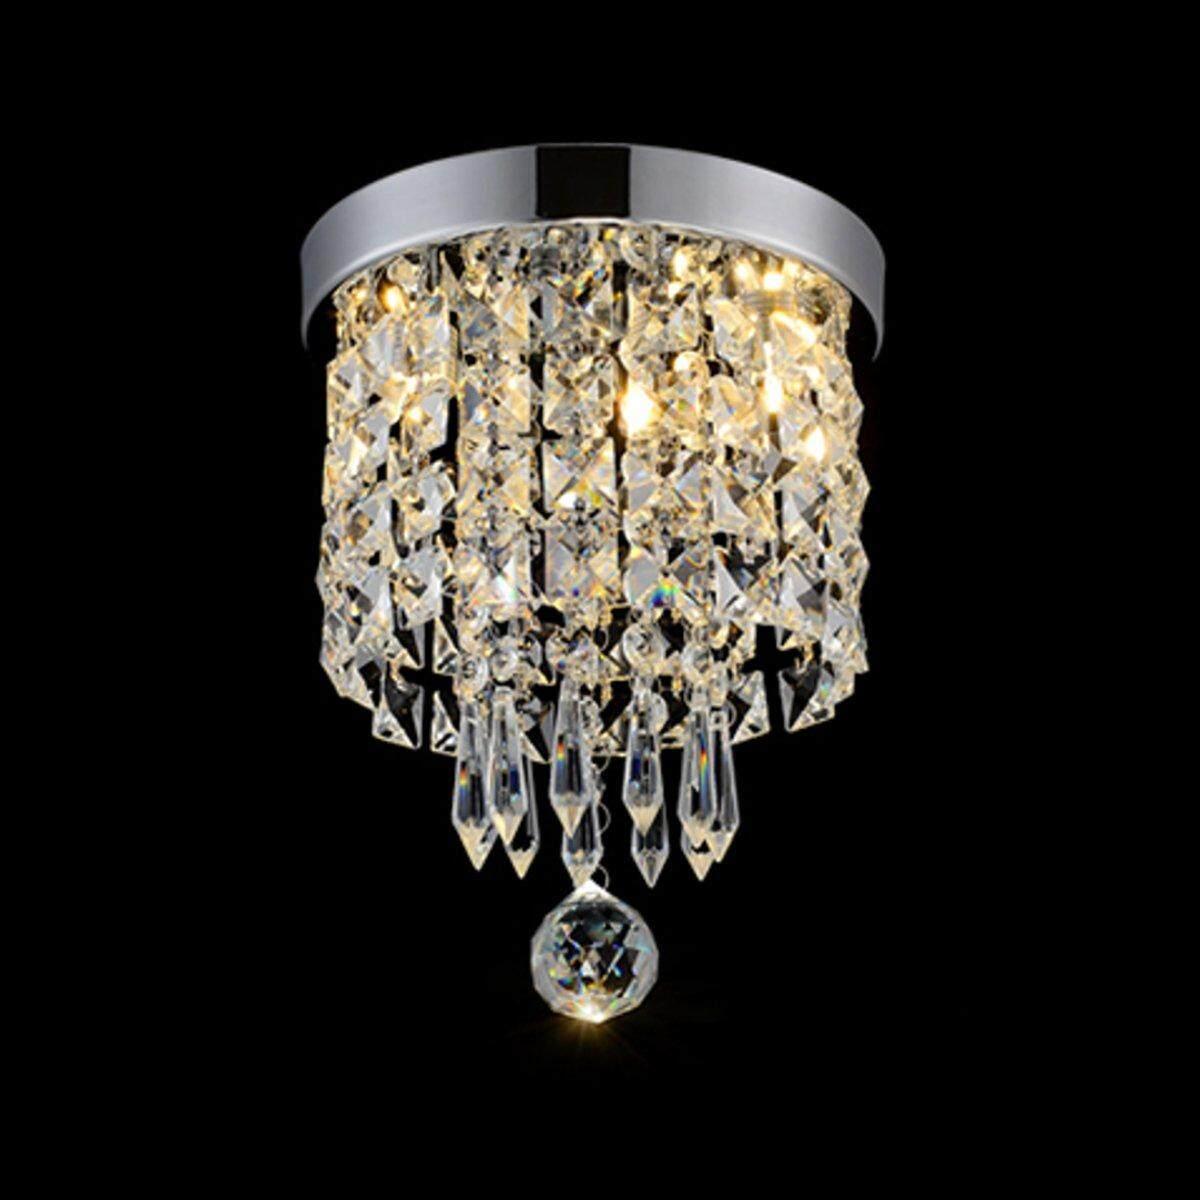 Elegant Chandelier Crystal Lamp Light Ceiling Pendant Mount Fixture Home Decor#Warm Light